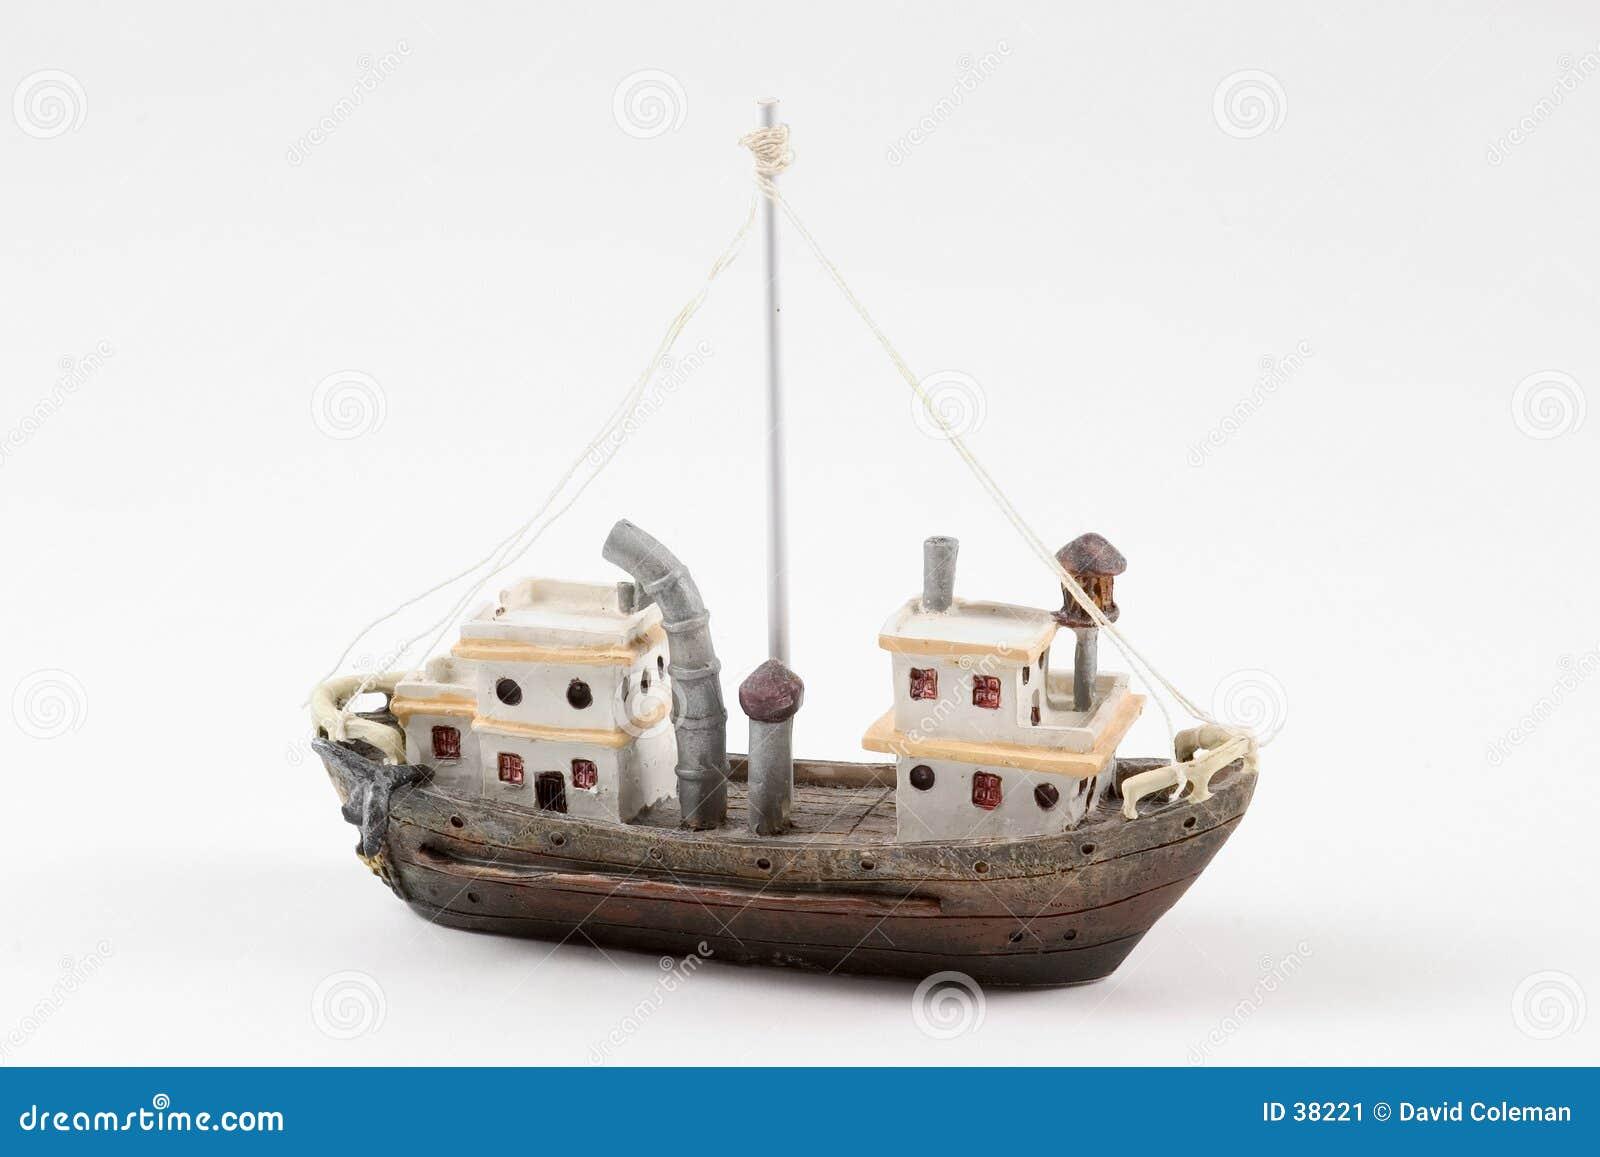 Boat on White